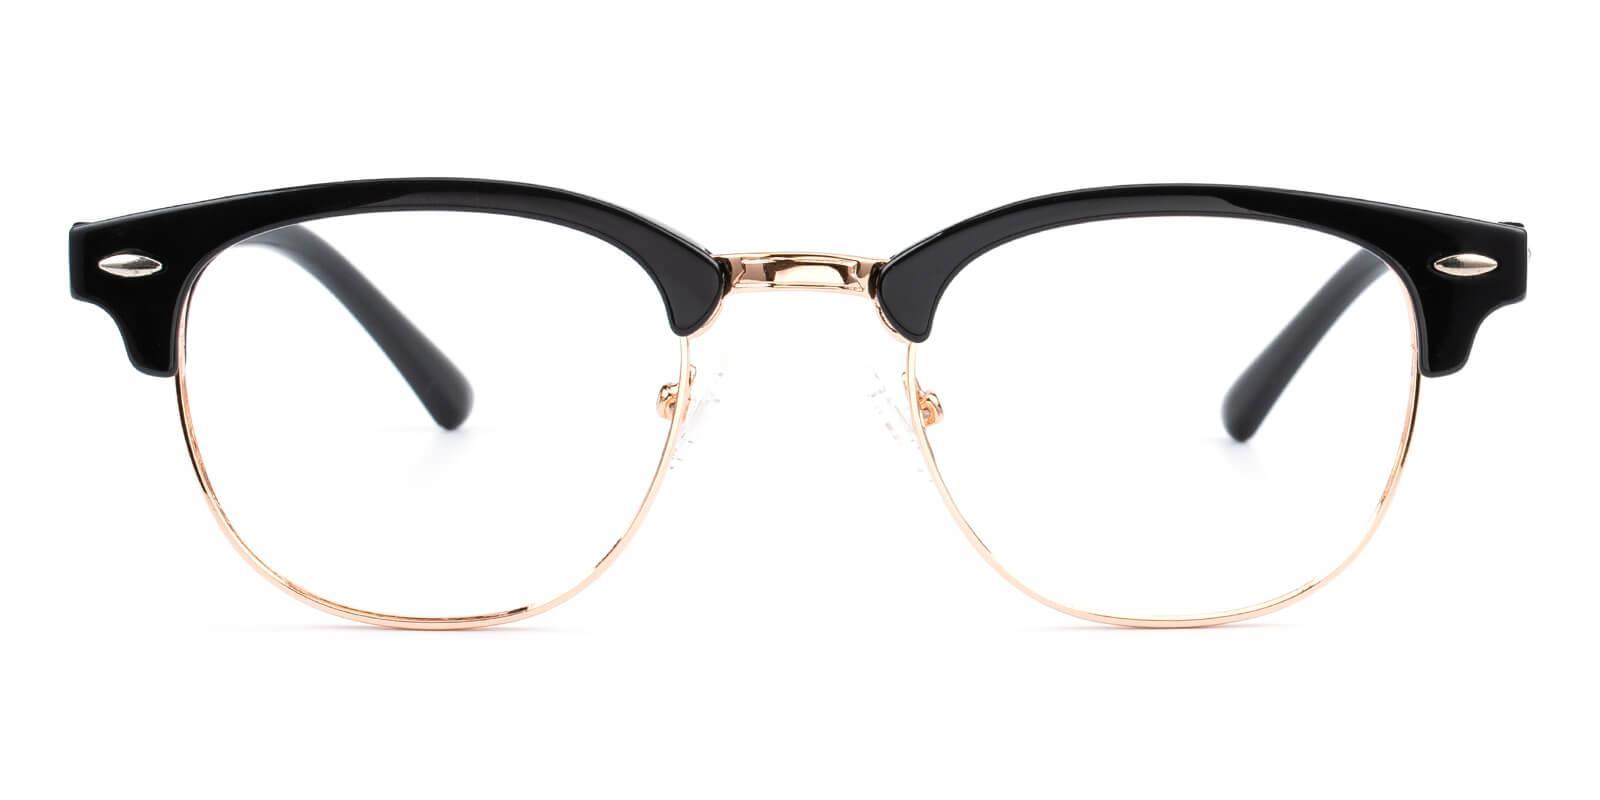 Creative-Black-Browline-Metal / Combination / Plastic-Eyeglasses-additional2